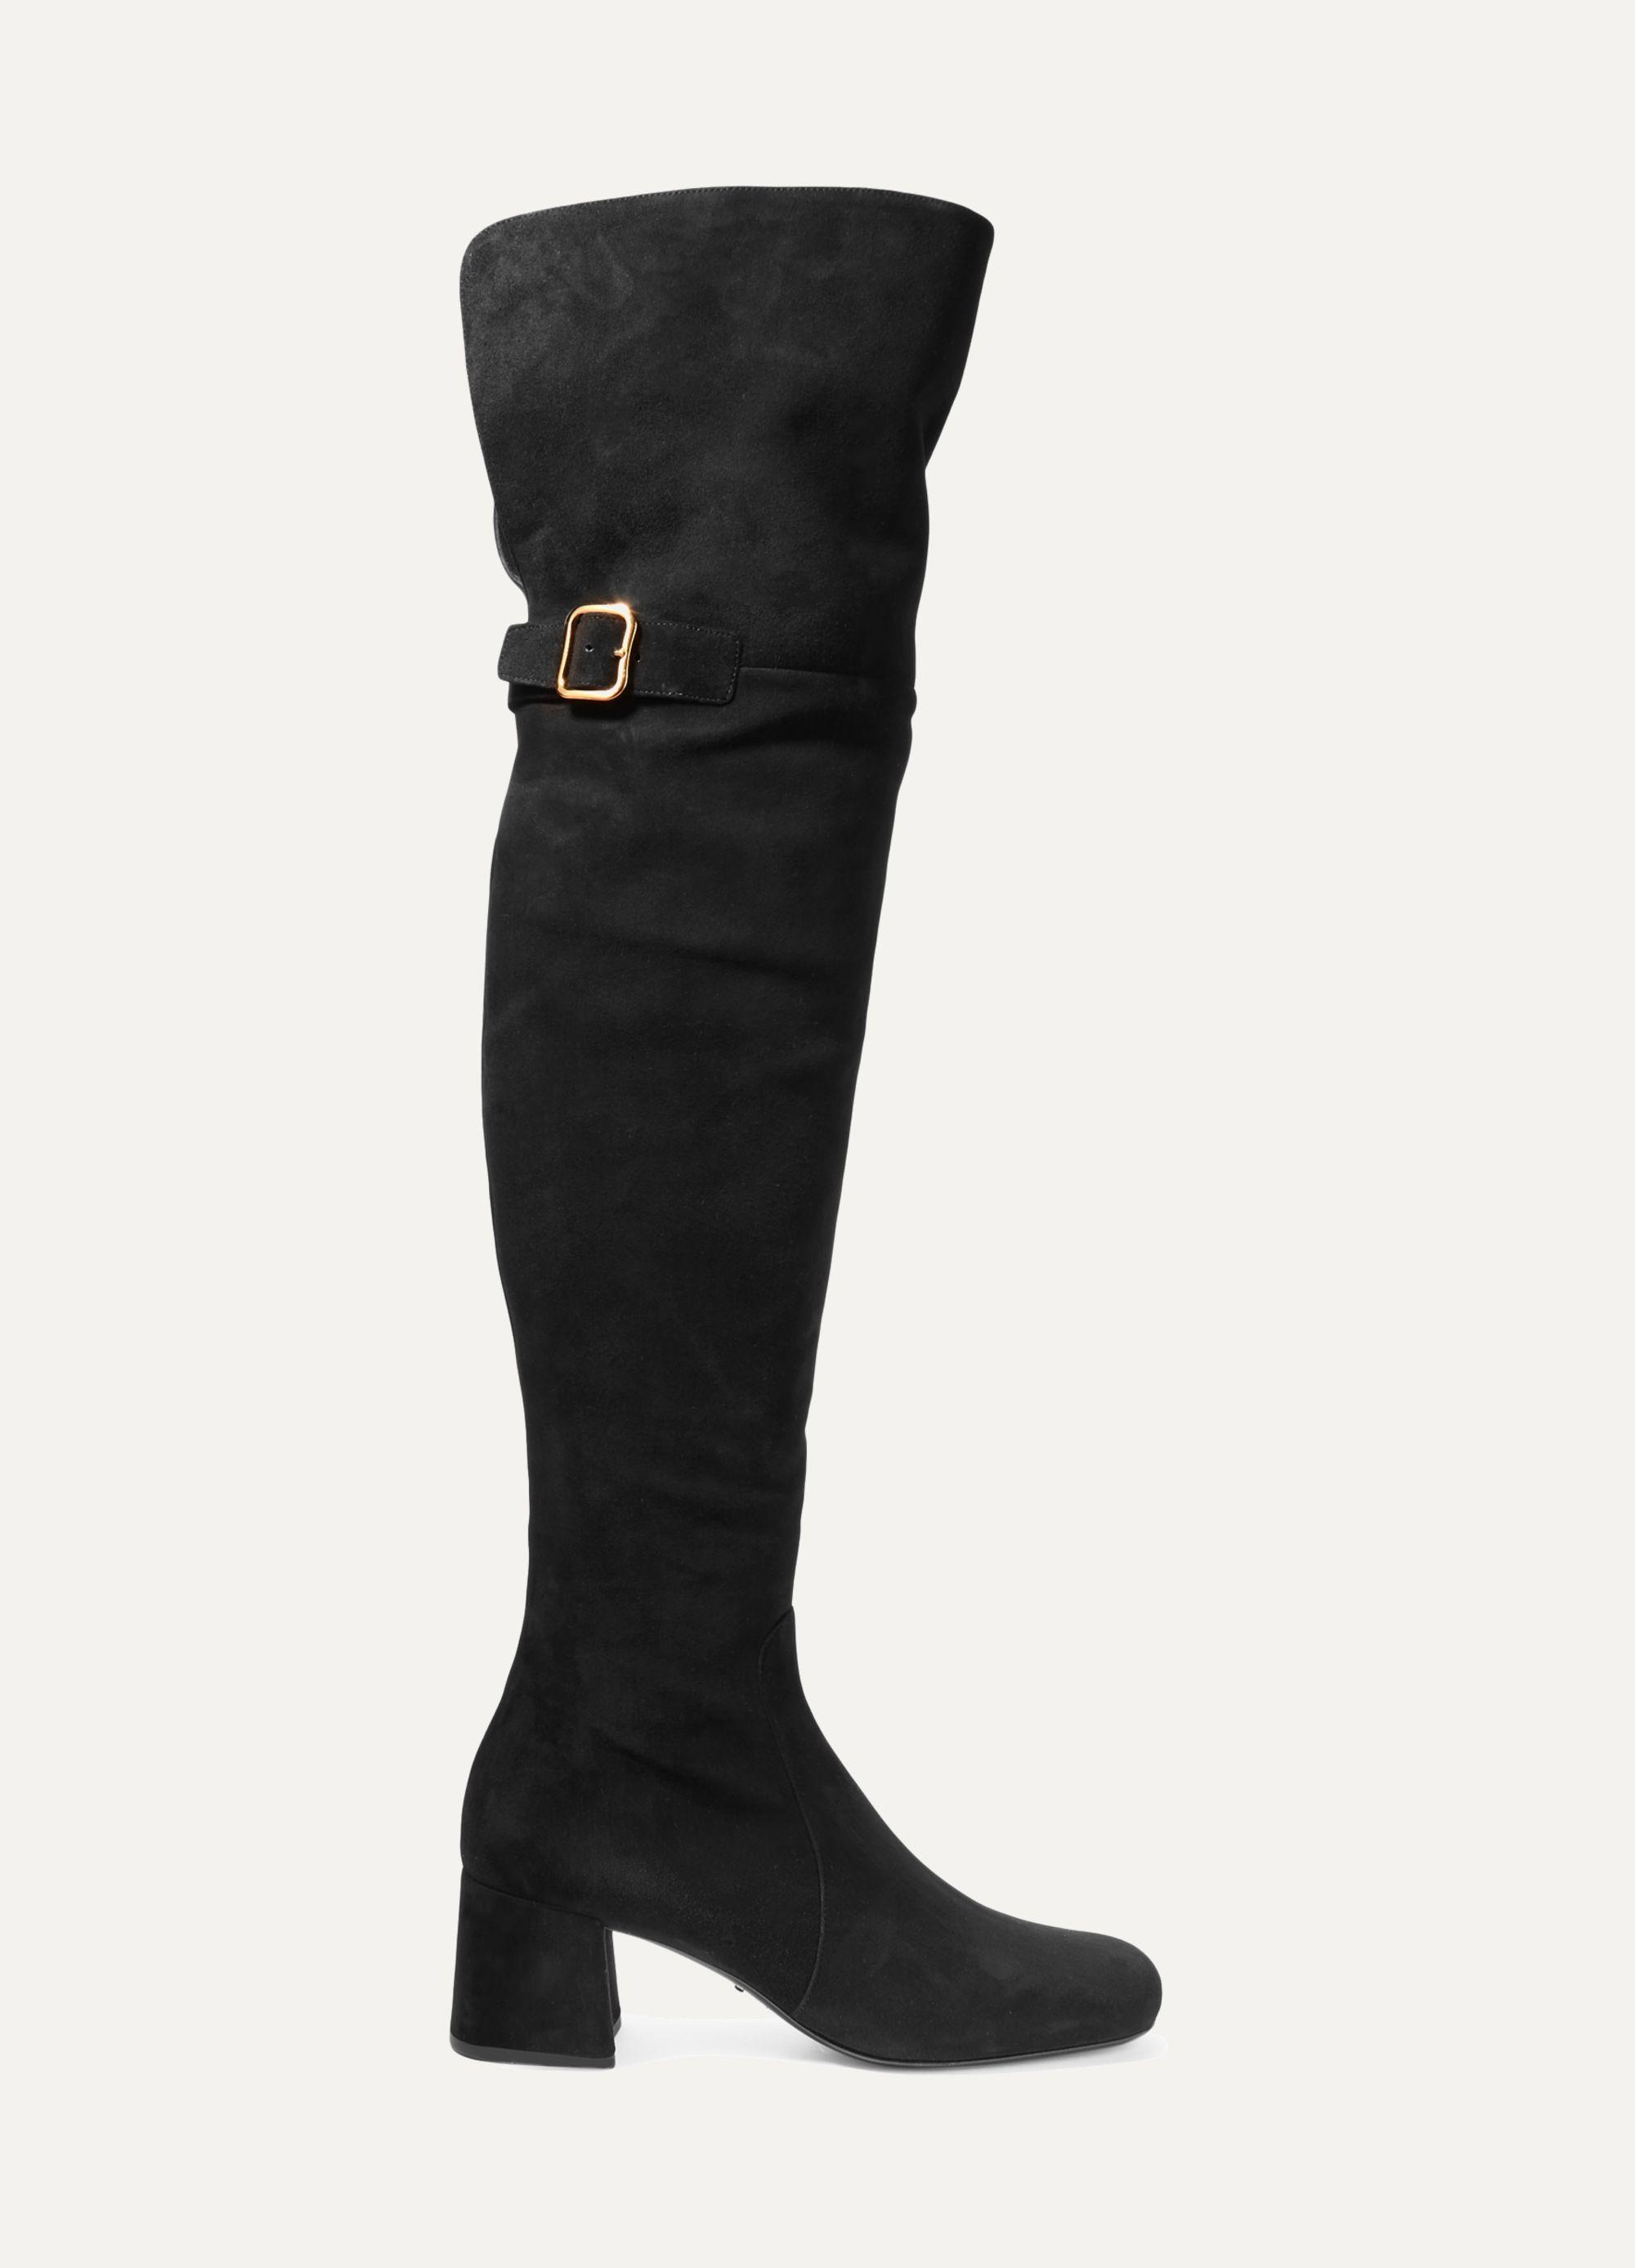 Black Suede over-the-knee boots   Prada